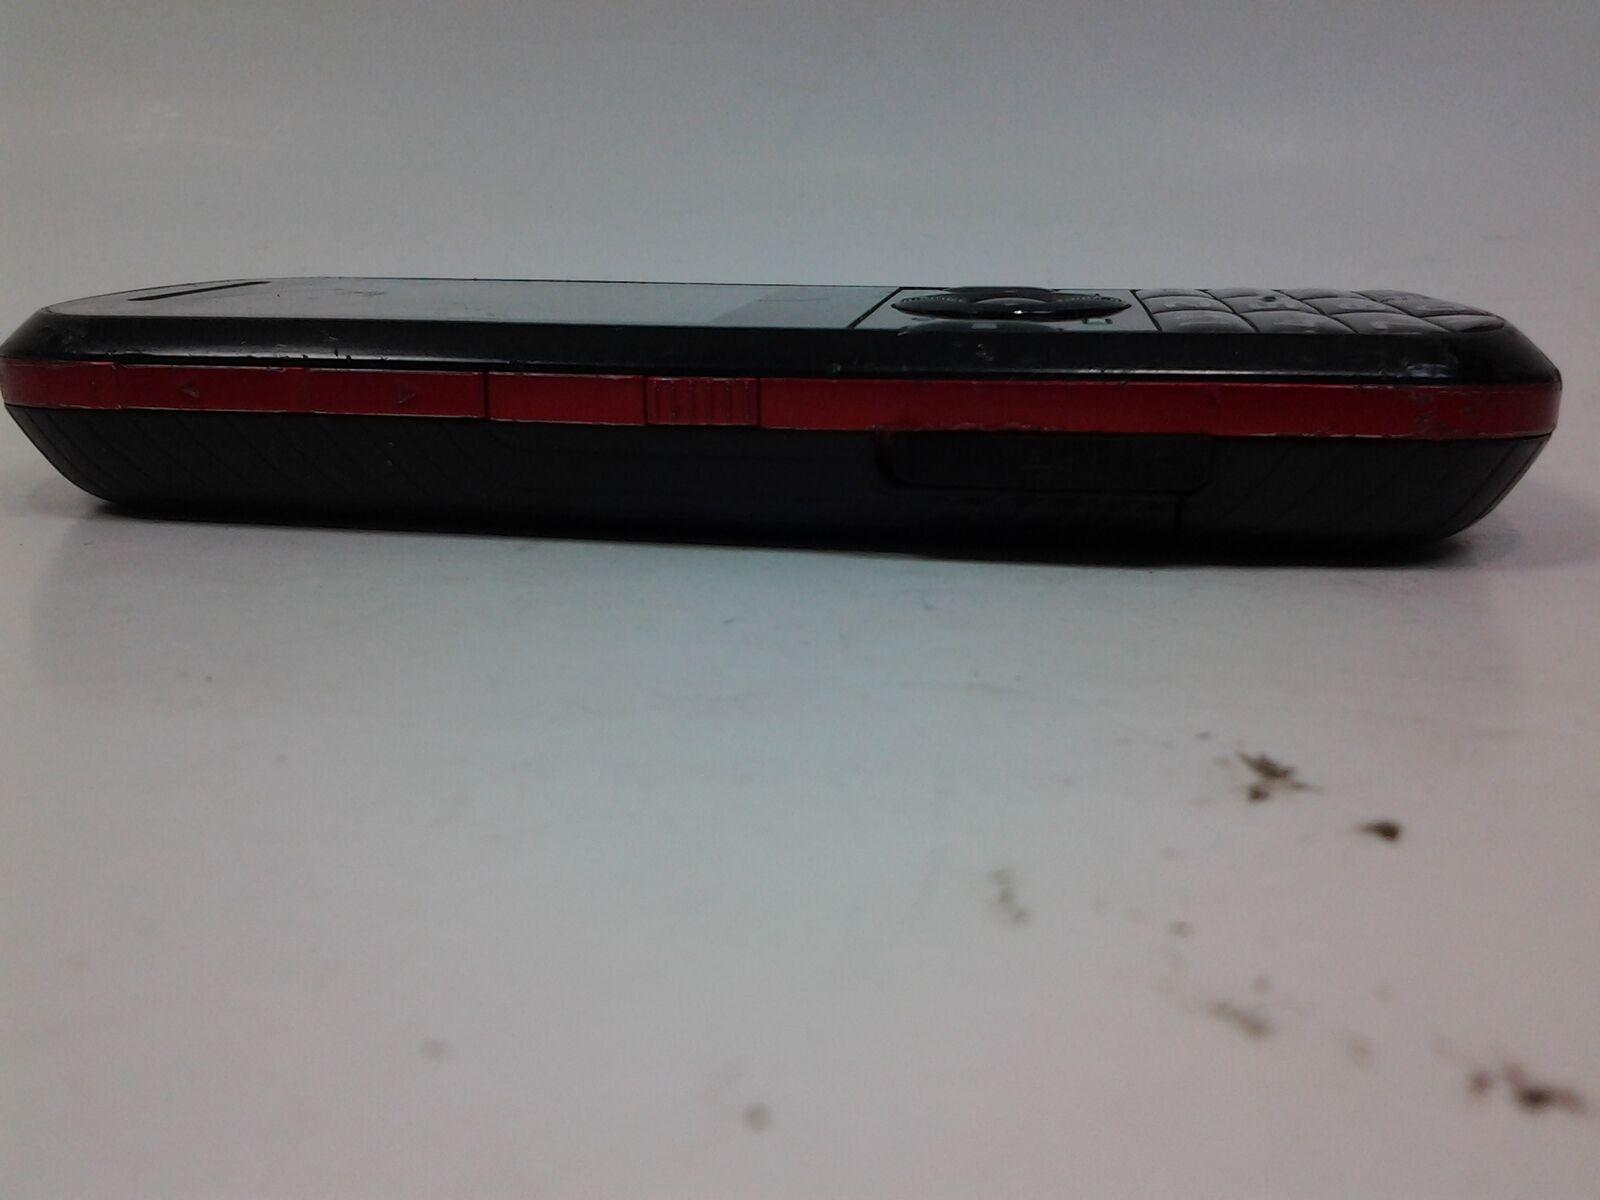 Motorola Model VE440 Black and Red Bar Cell Phone image 3